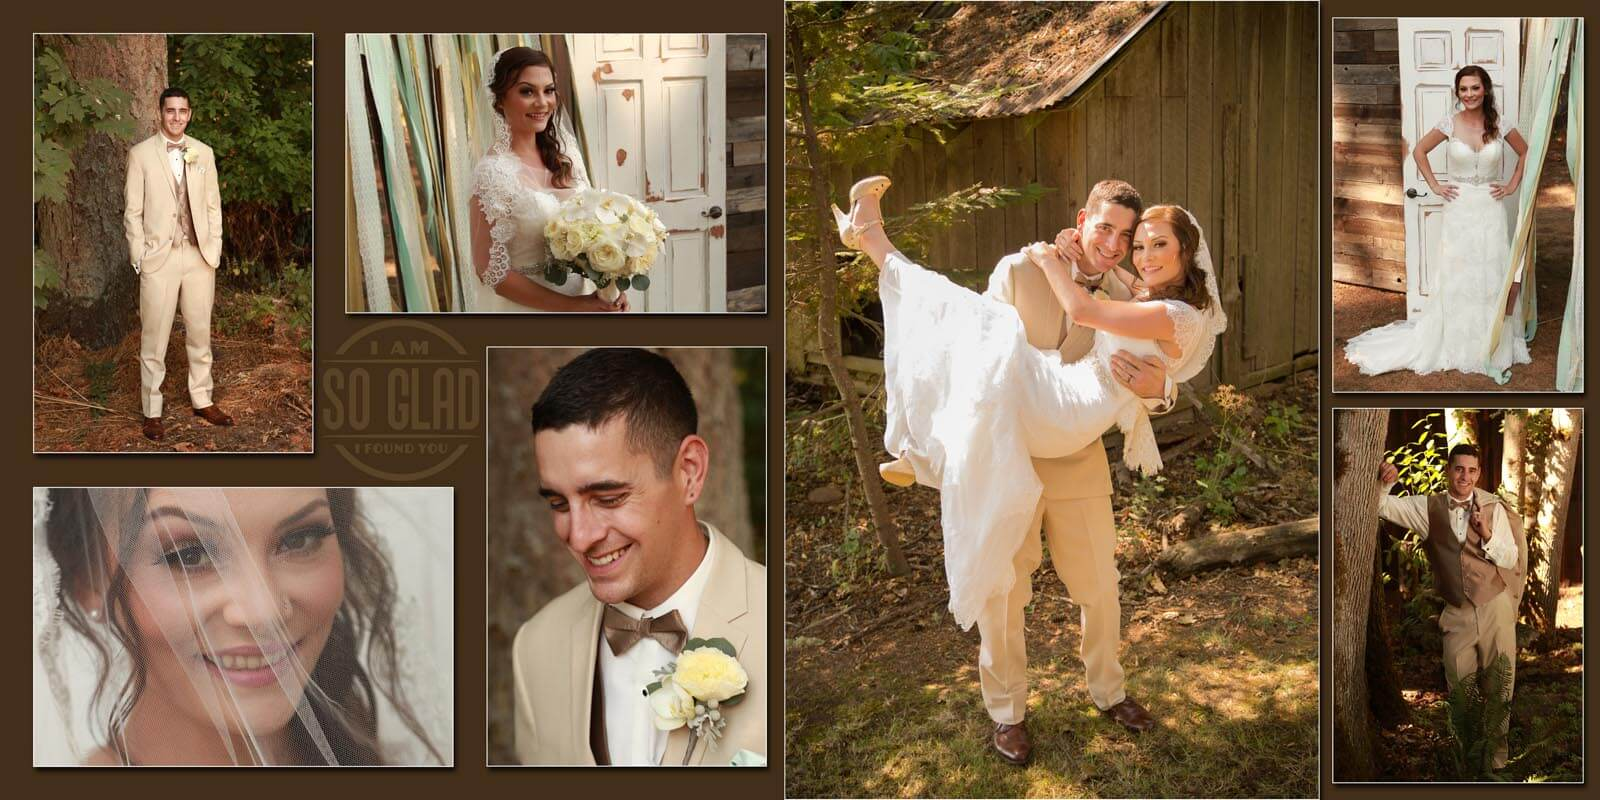 Jasper-House-Farm-Outdoor-Wedding-Lane-County-Oregon-photographers-008-009.jpg